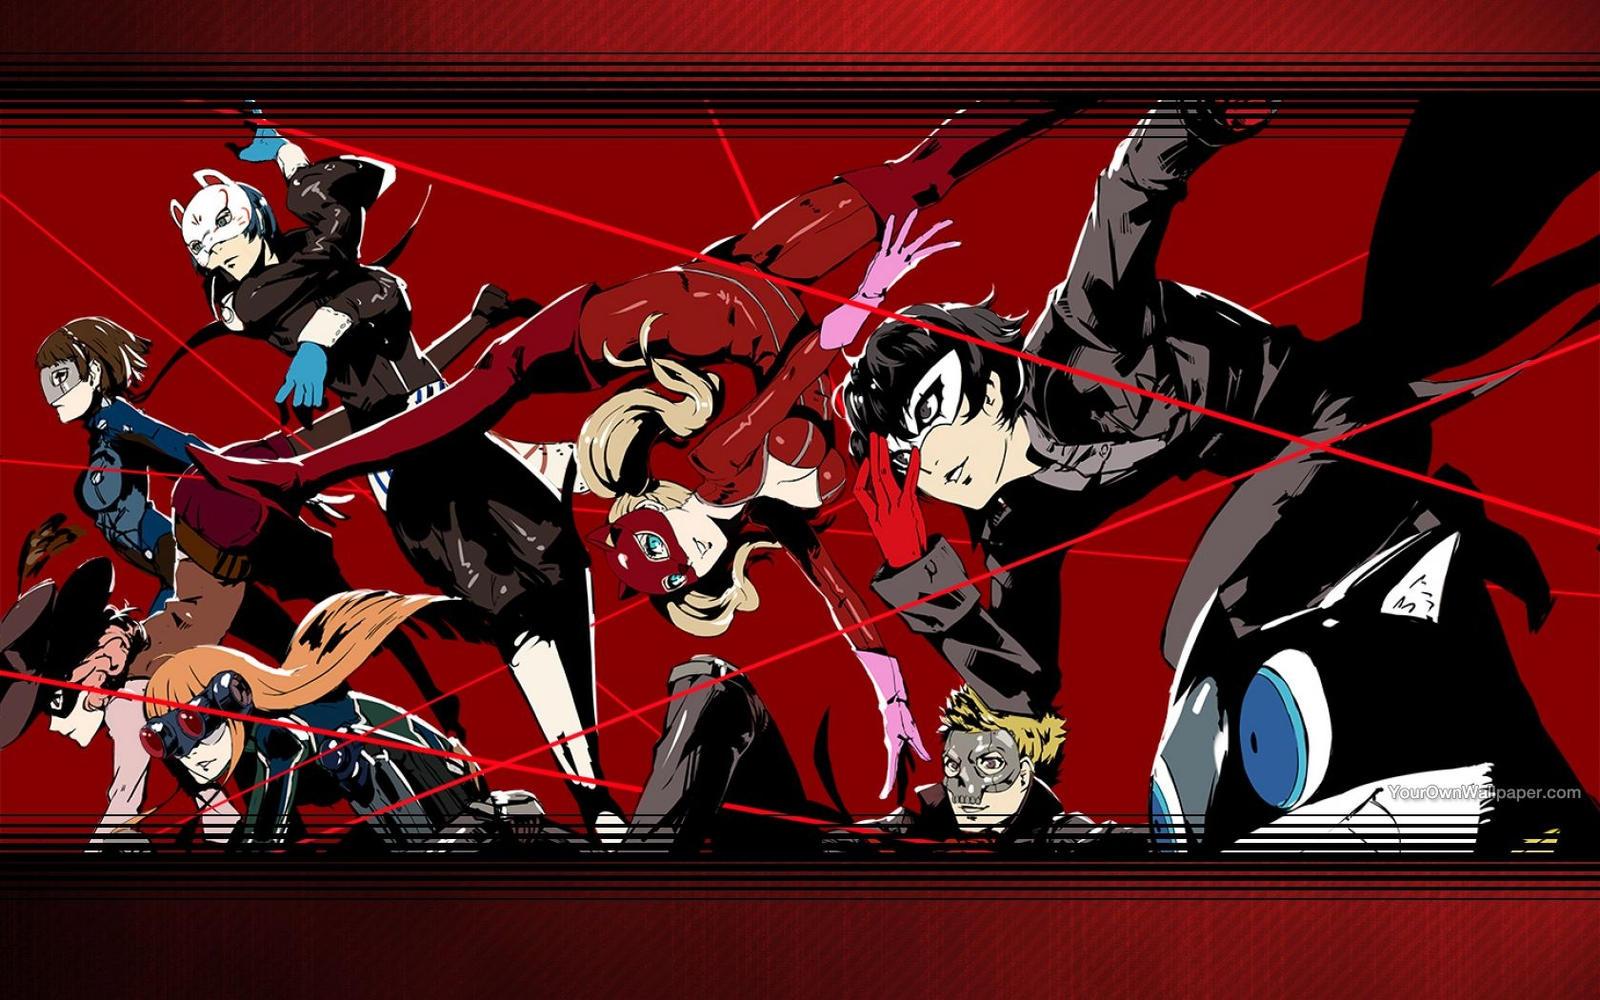 Persona 5 Wallpaper by CatCamellia on DeviantArt